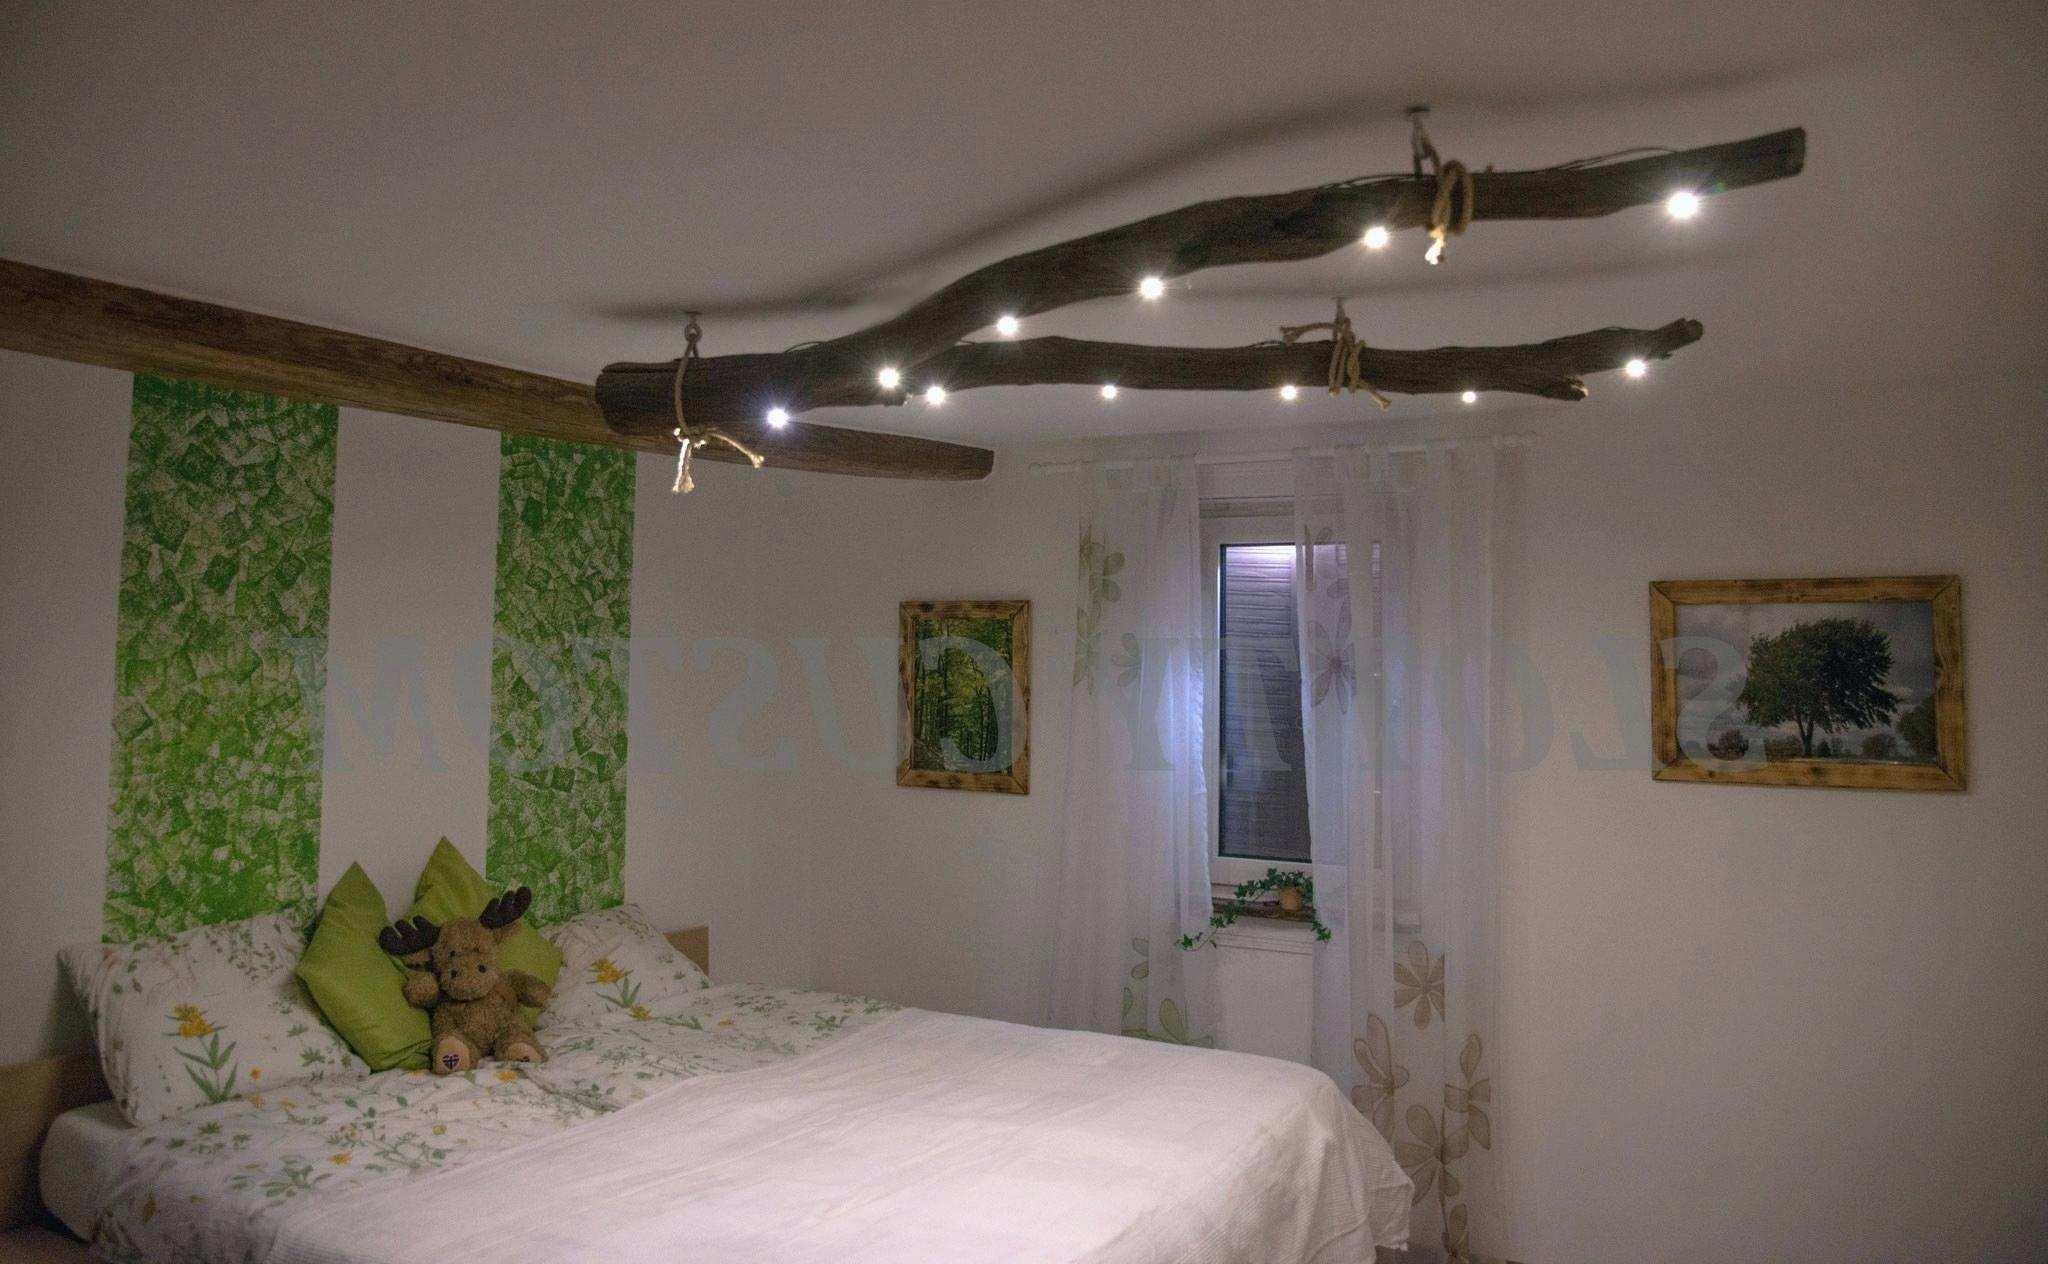 Full Size of Moderne Schlafzimmer Lampen Genial Designer Rauch Komplett Weiß Sessel Betten Vorhänge Massivholz Stuhl Landhausstil Set Lampe Nolte Truhe Günstige Schlafzimmer Lampen Schlafzimmer